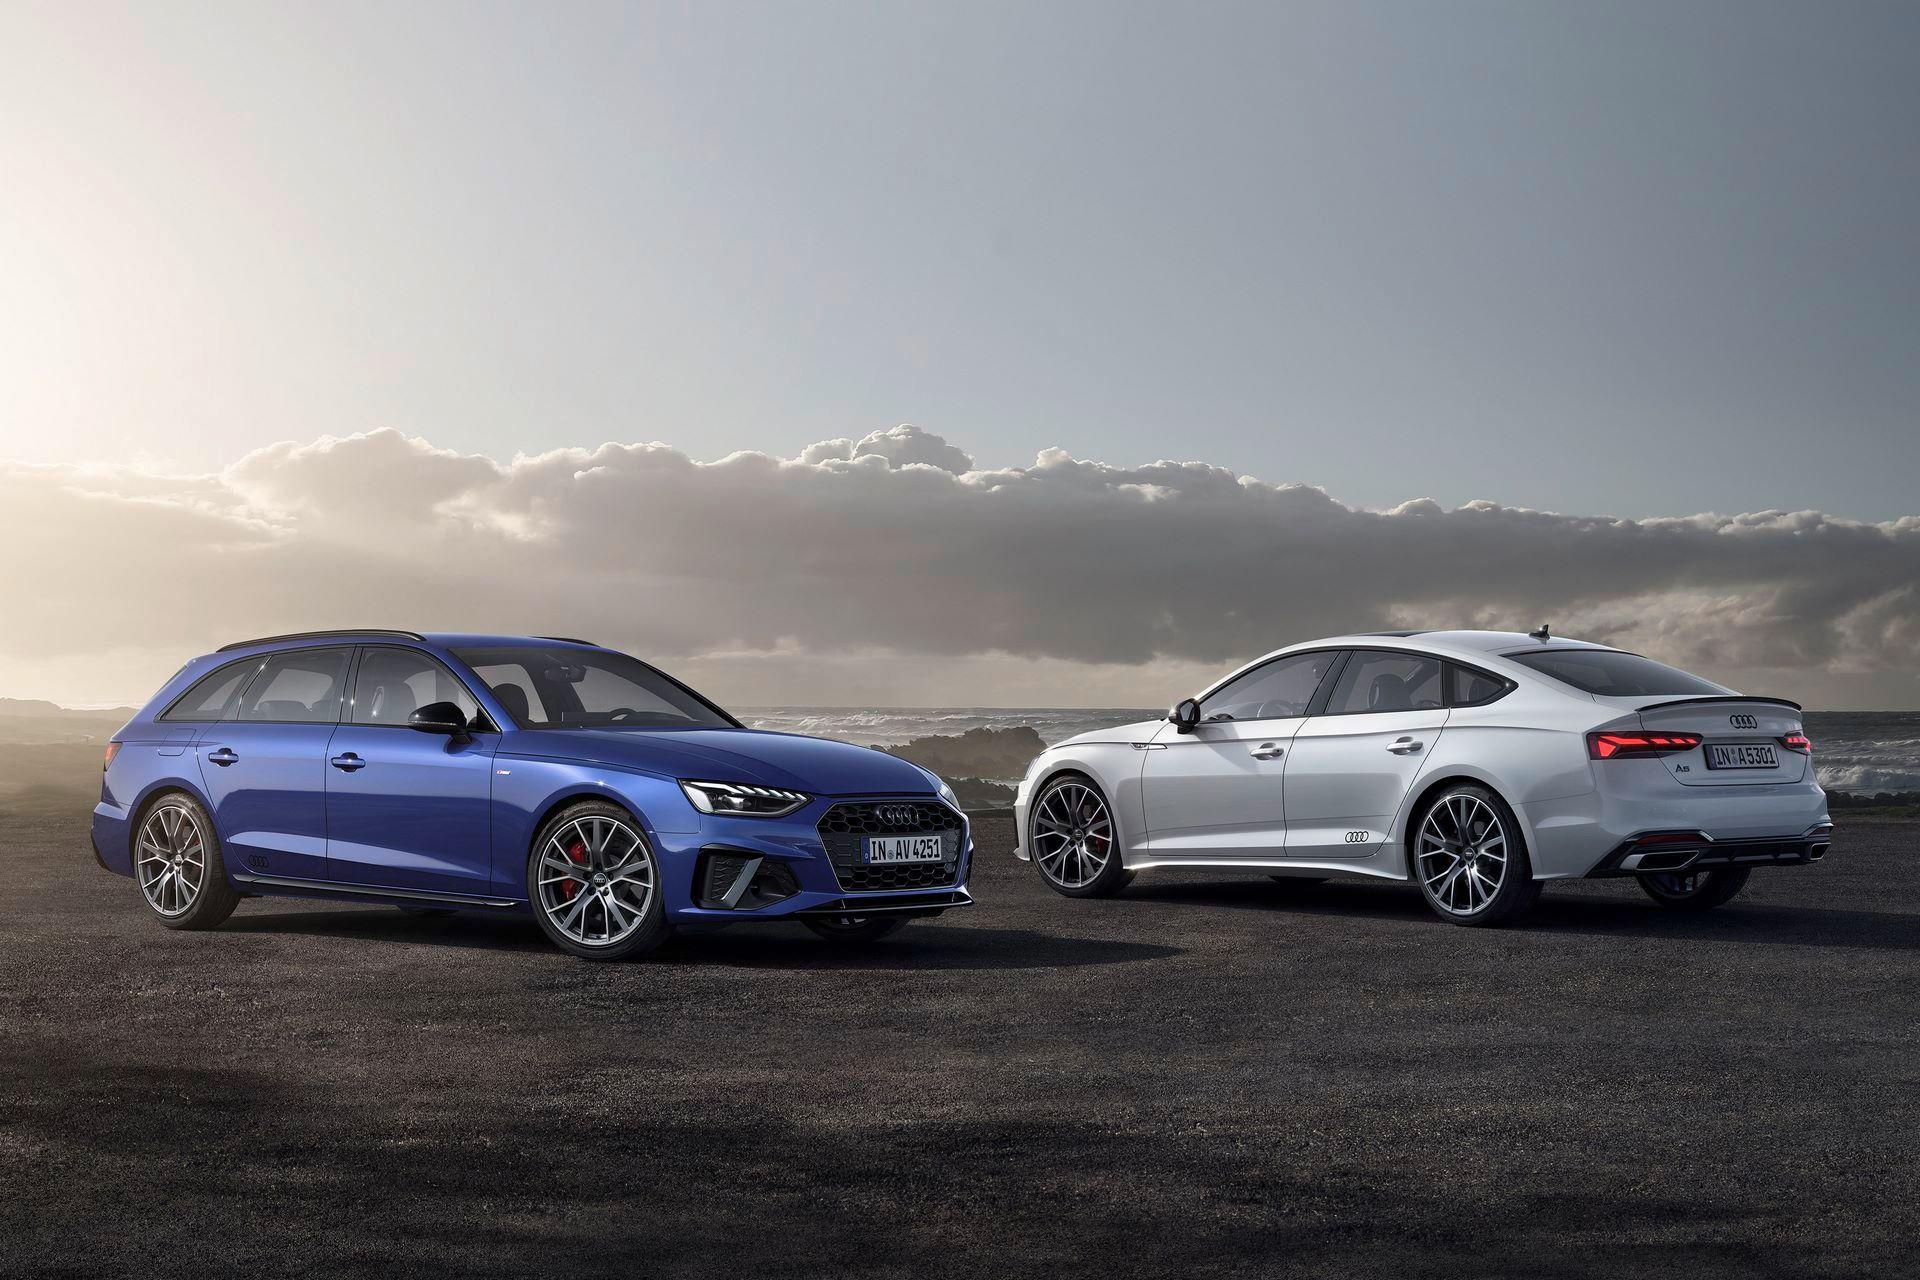 1_Audi-A4-A5-Q7-Q8-Competition-And-Competition-Plus-Trims-2